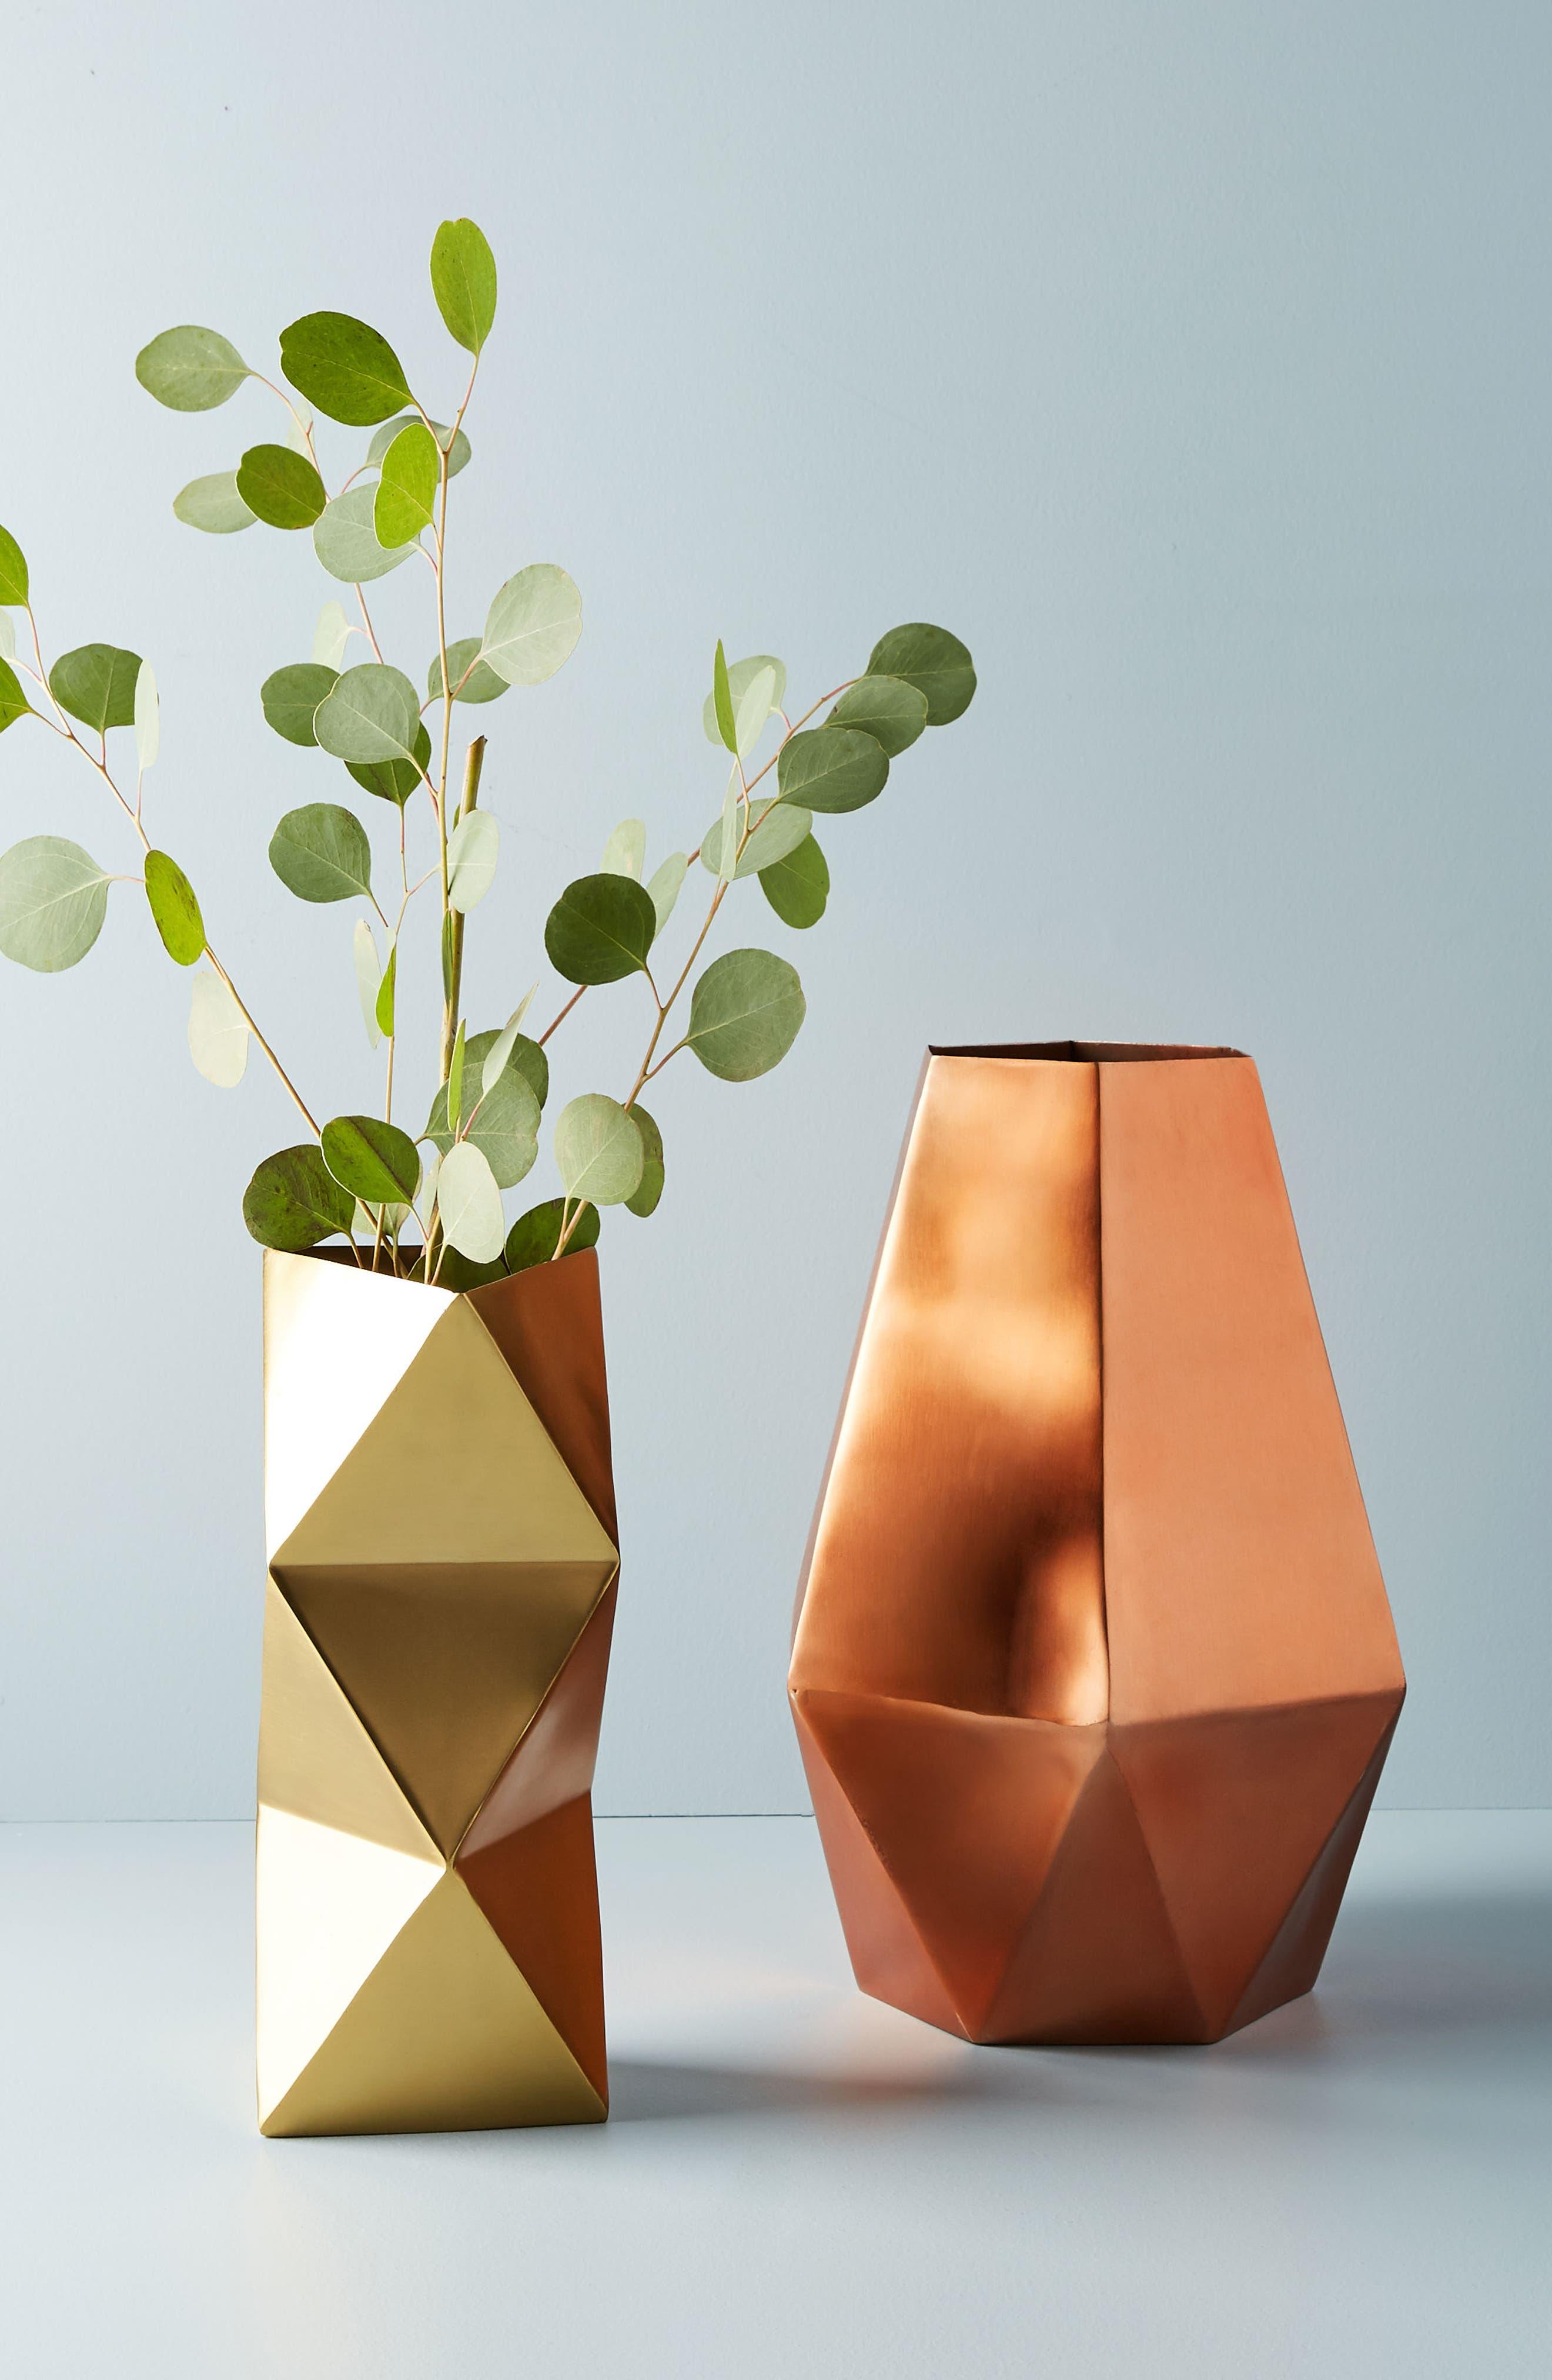 Faceted Hexagon Metal Vase,                             Alternate thumbnail 3, color,                             220